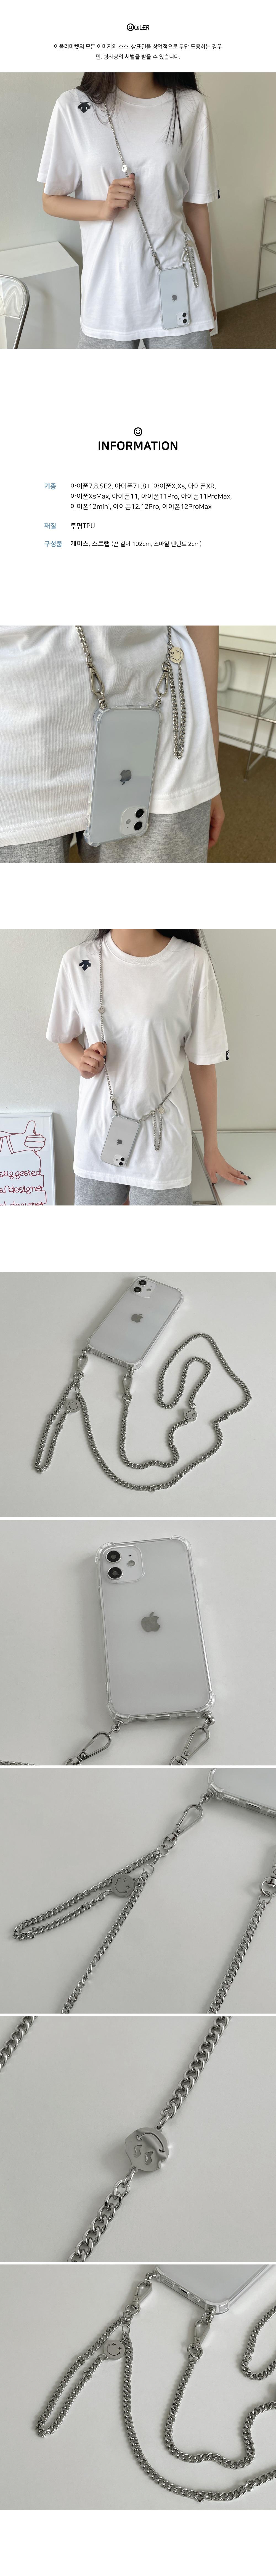 Cross Silver Smile Chain Strap Transparent Bumper iPhone Case